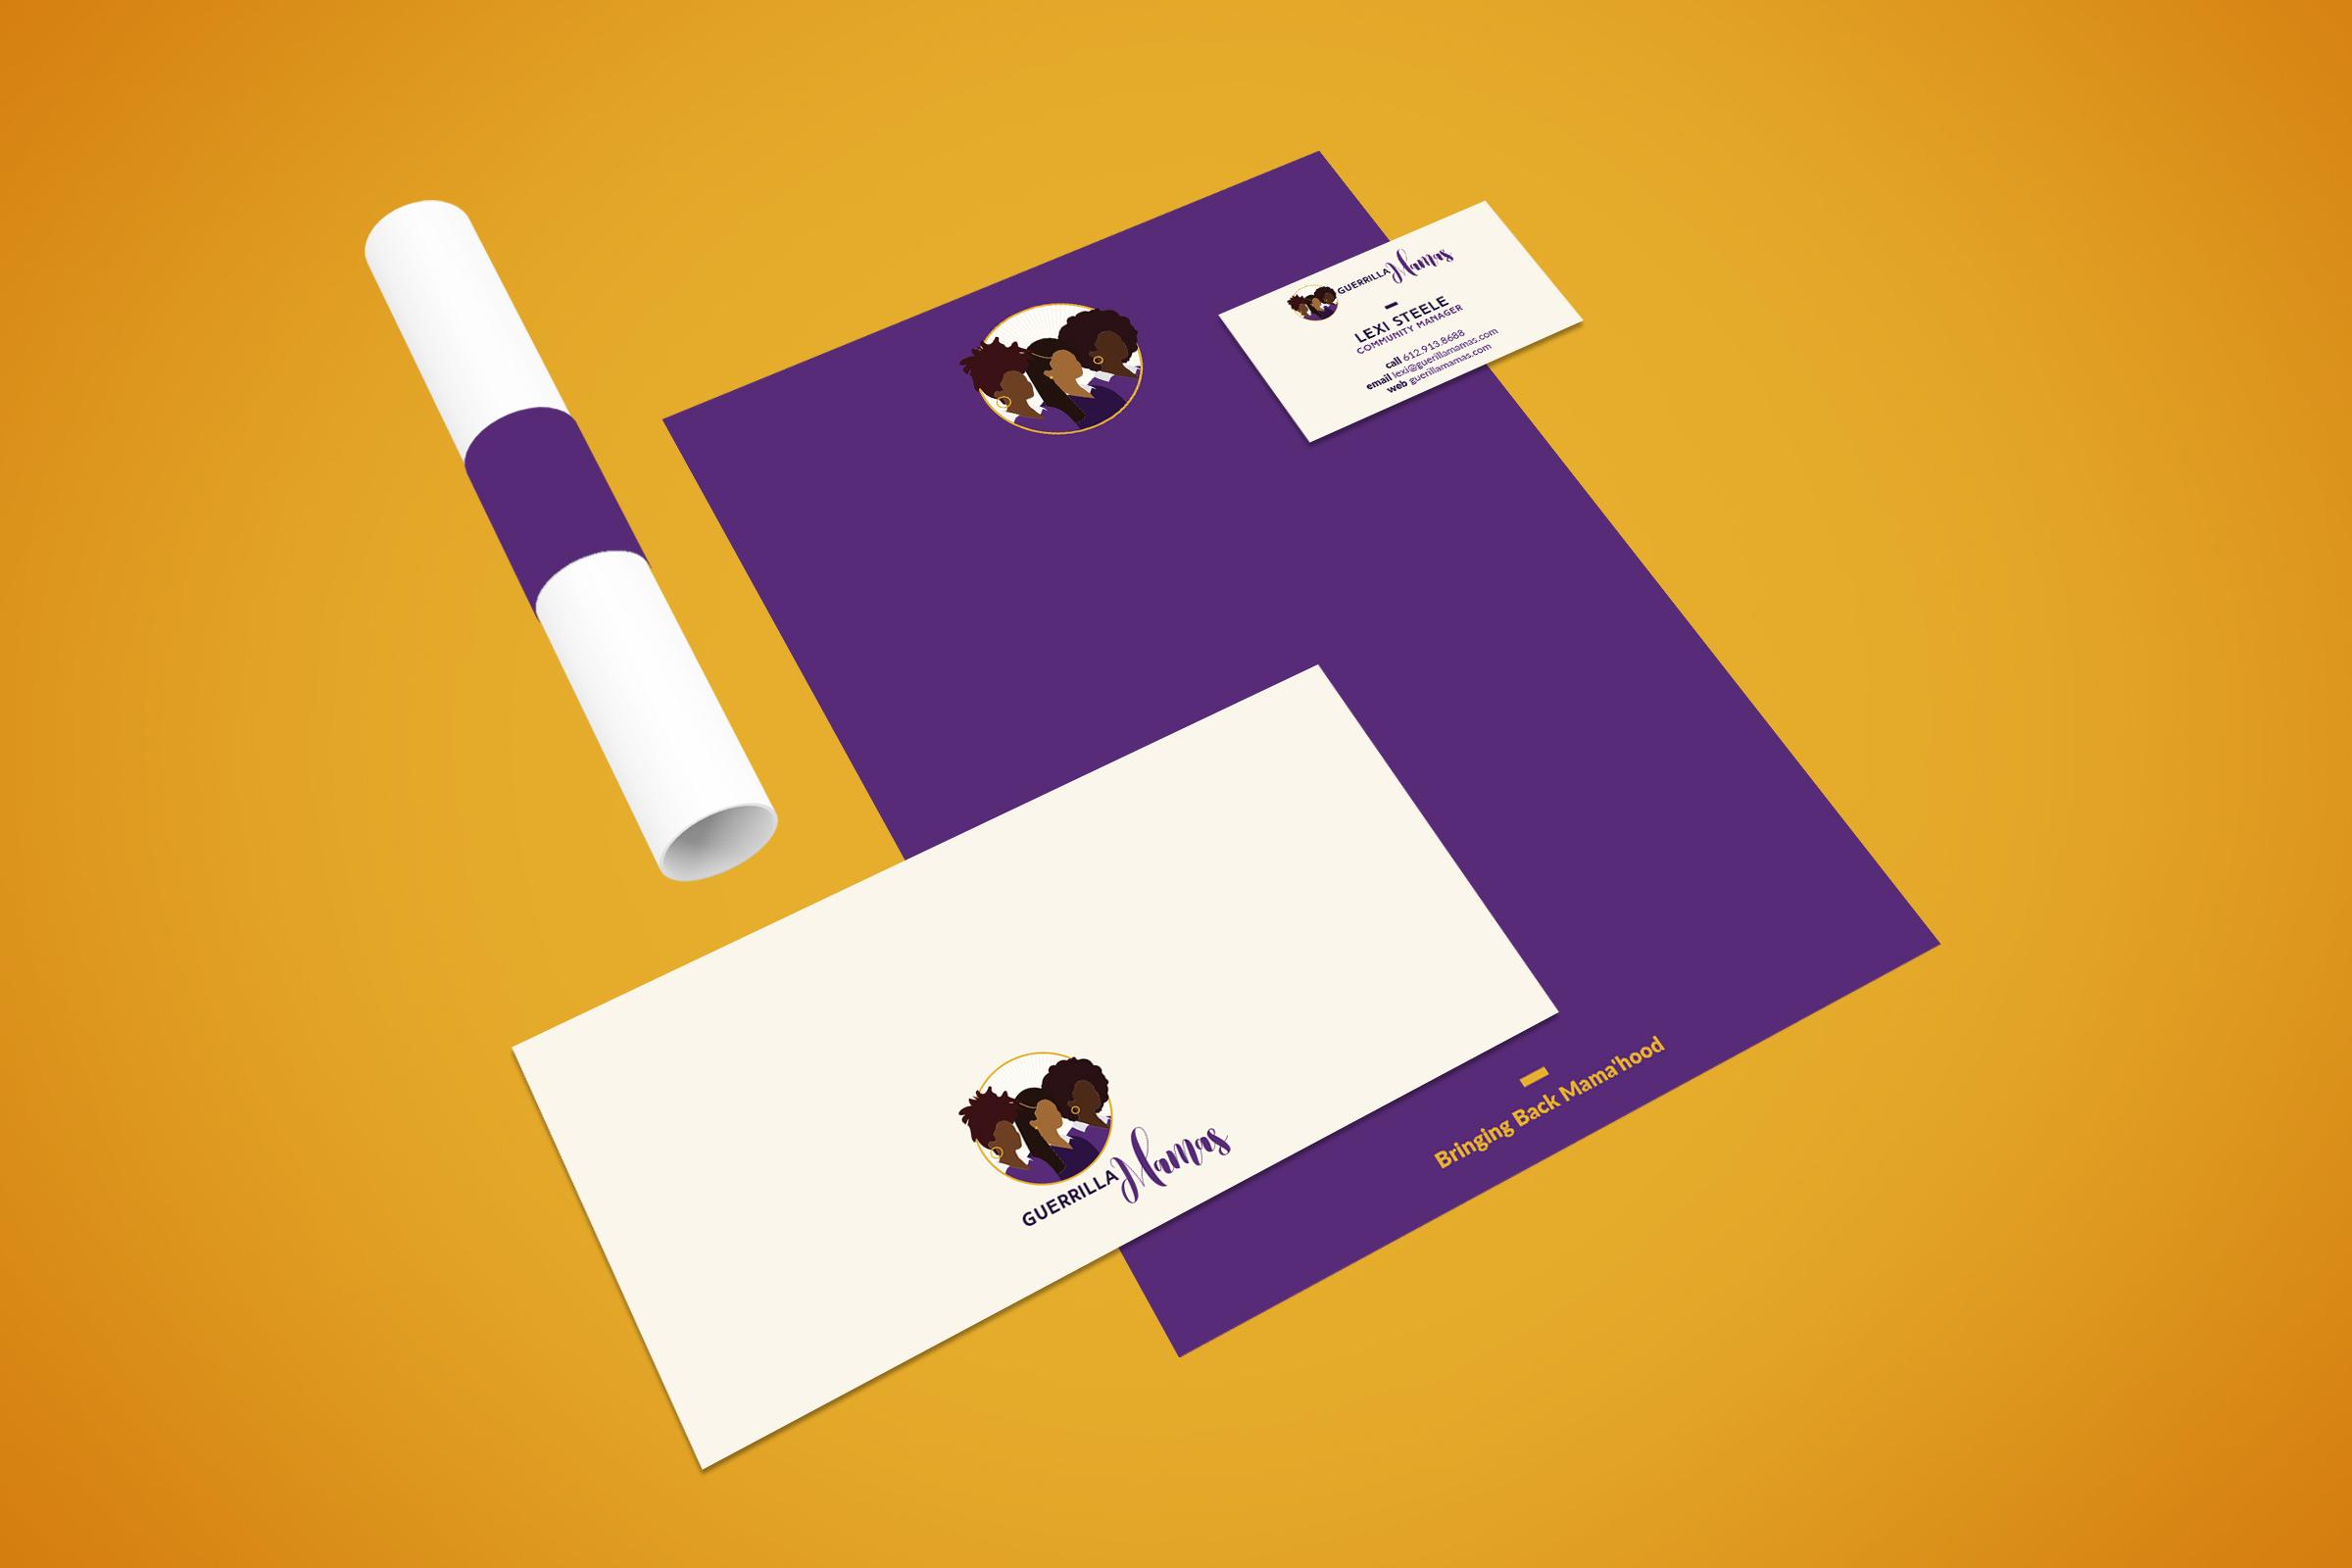 hearthfire-creative-logo-brand-identity-designer-denver-colorado-guerrilla-mamas-2.jpg